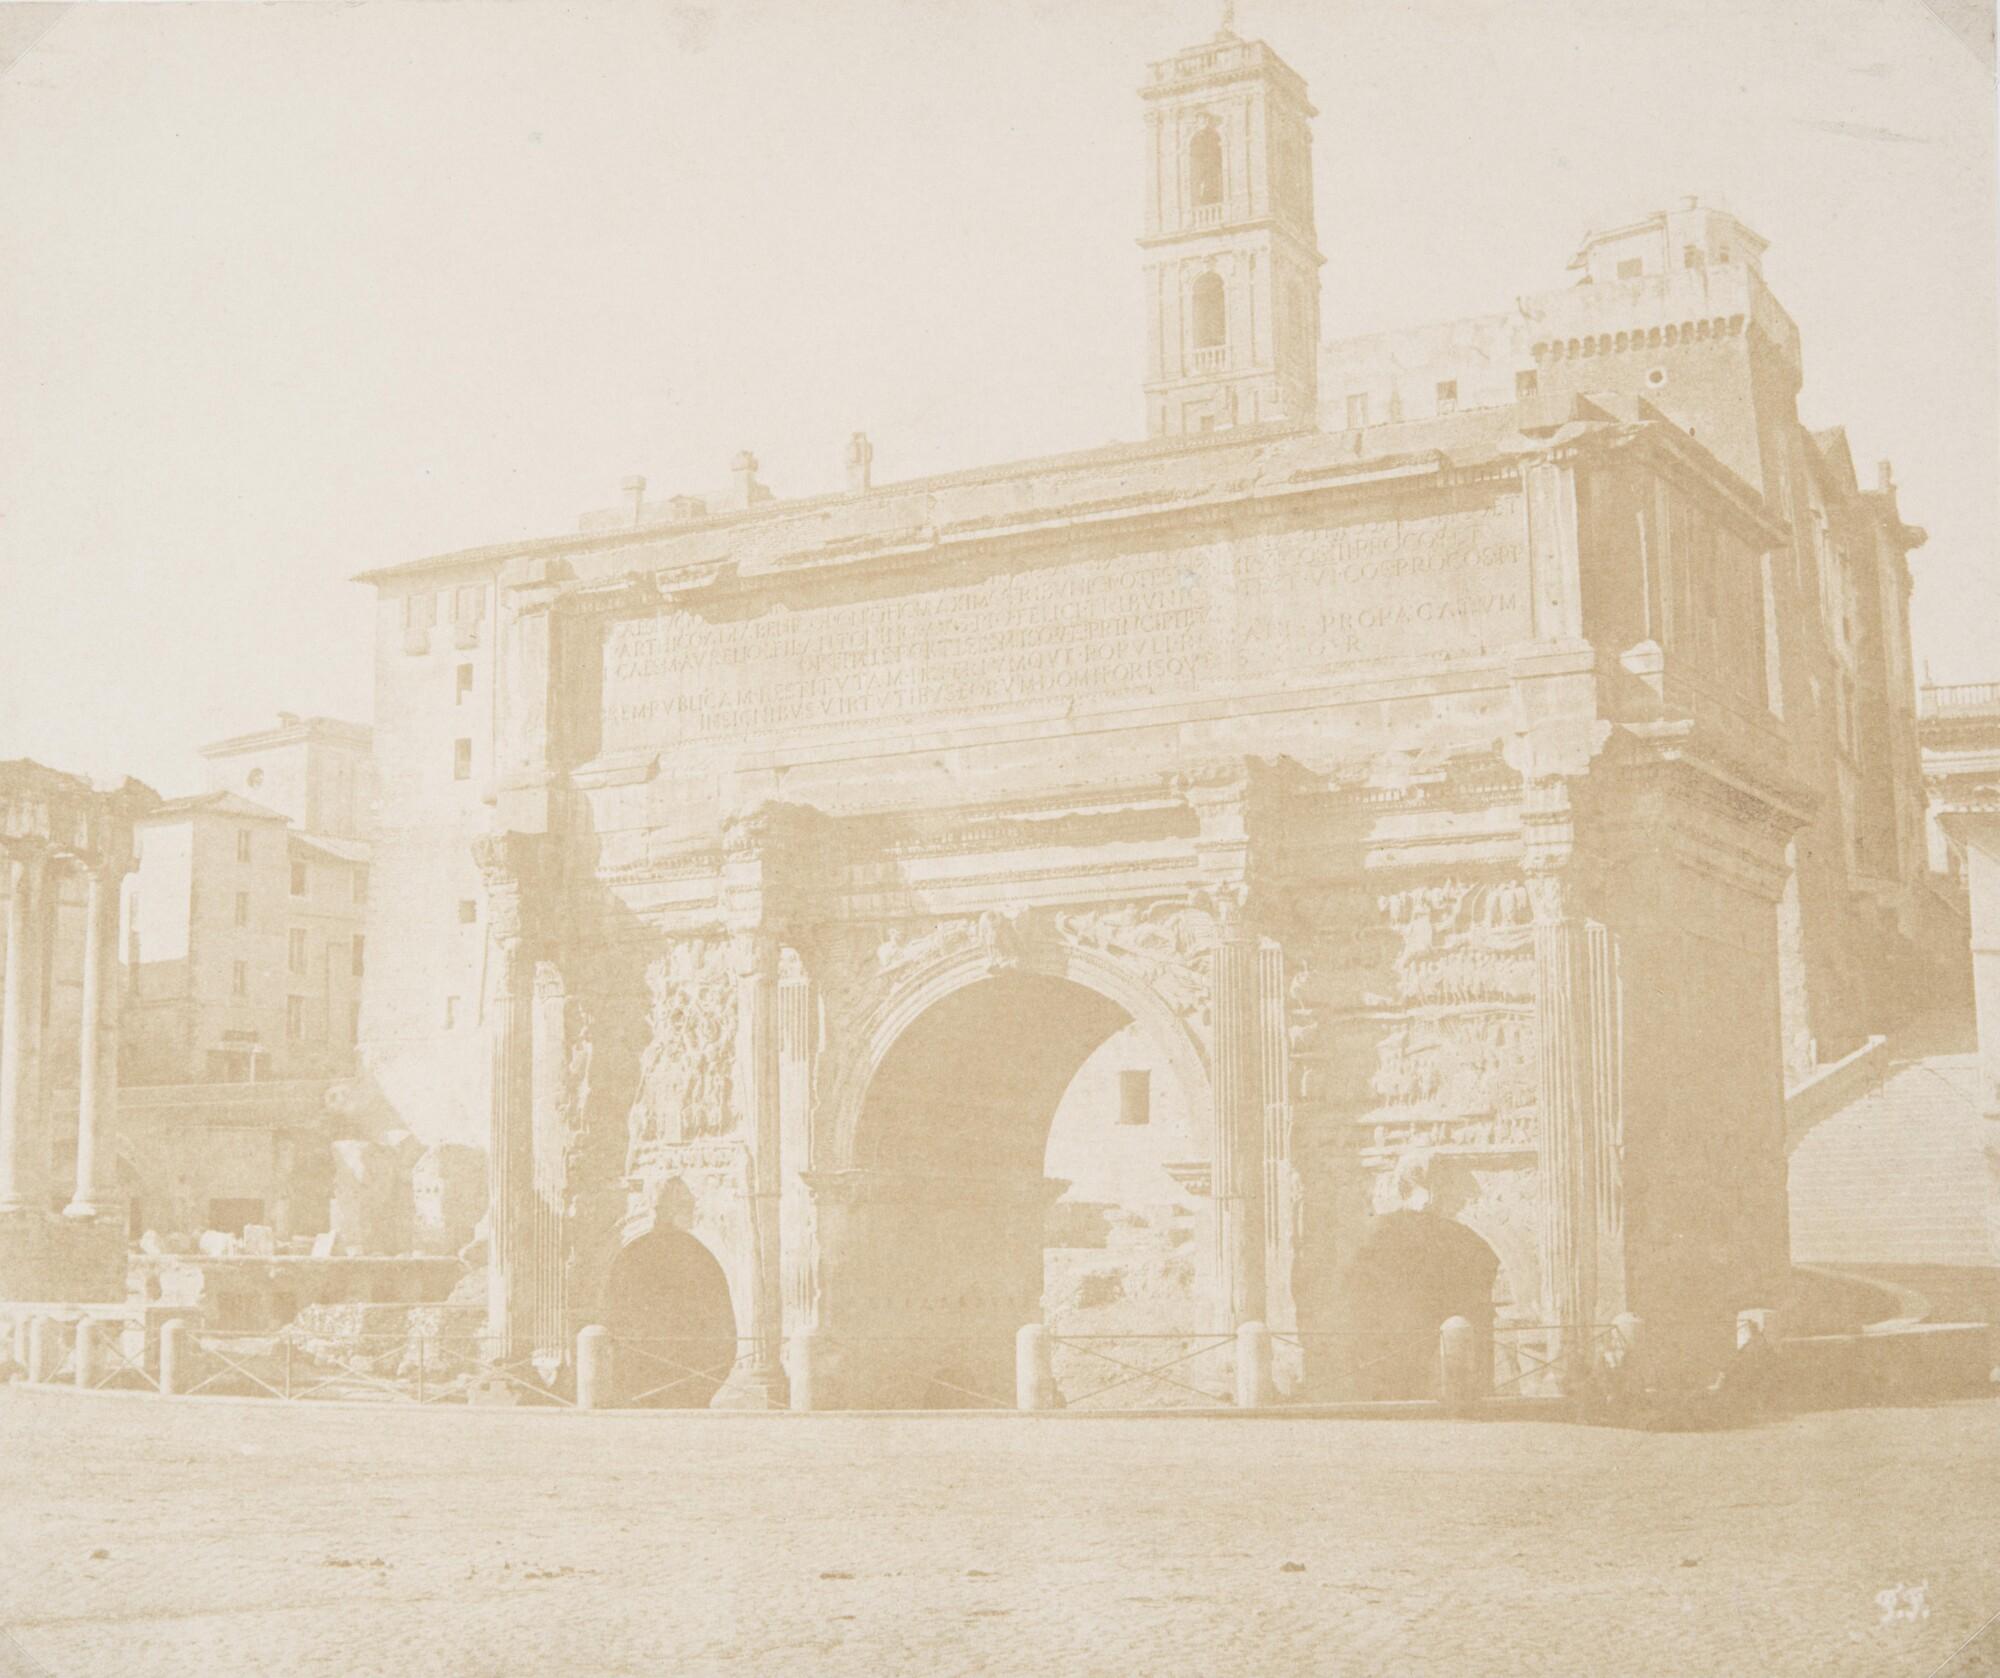 Фредерик Флашерон.    Арка Септимия Севера. Римский форум, 1848–1850   Отпечаток на соленой бумаге